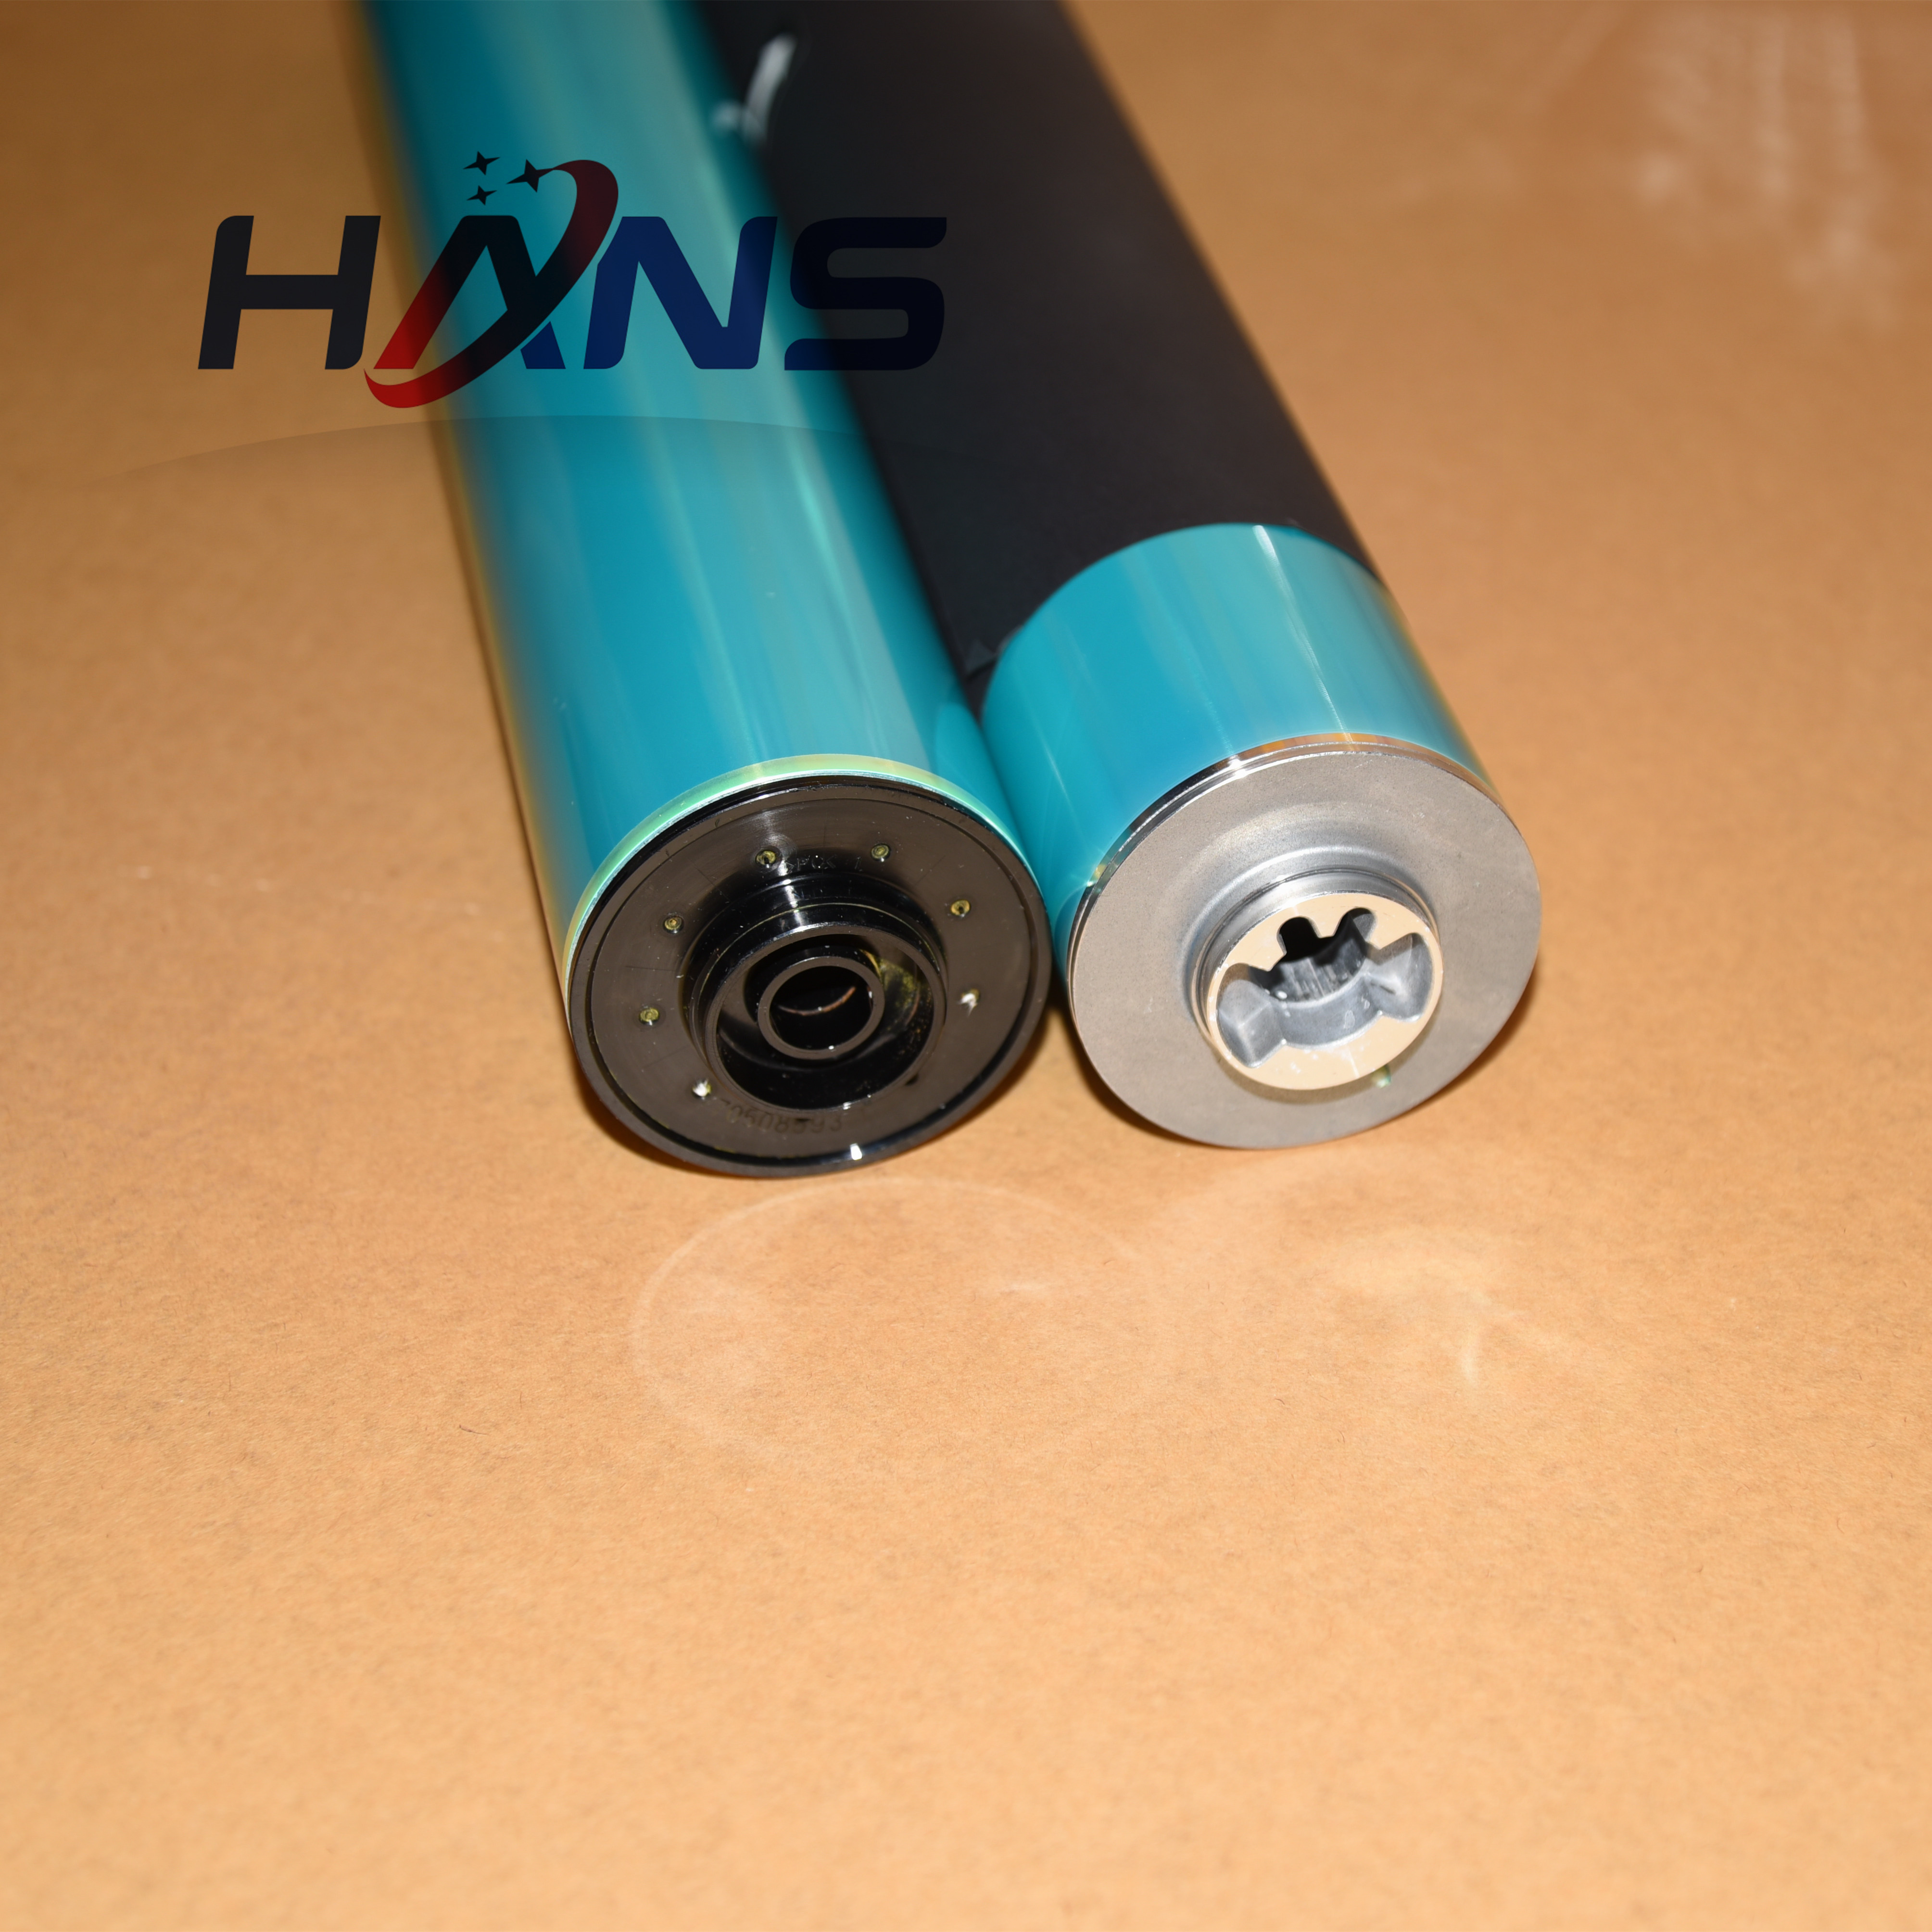 2pc Japan DR610 Cylinder Drum OPC Drum for Konica Minolta Bizhub Pro C500 C5500 C5501 C6500